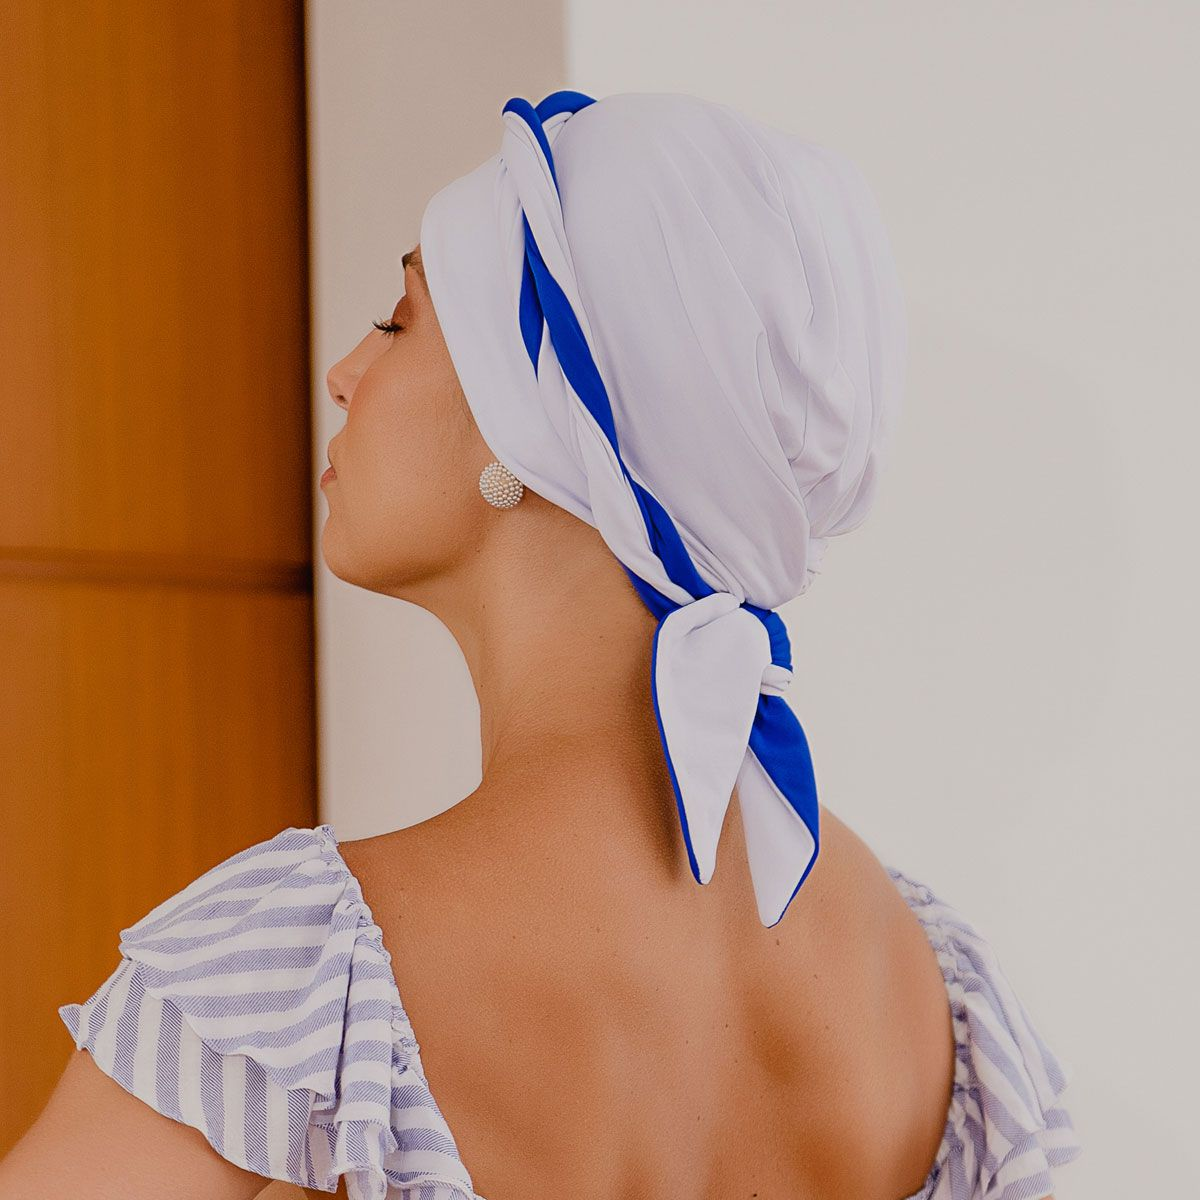 Turbante Feminino Dupla Face Vicky Branco com Azul Royal